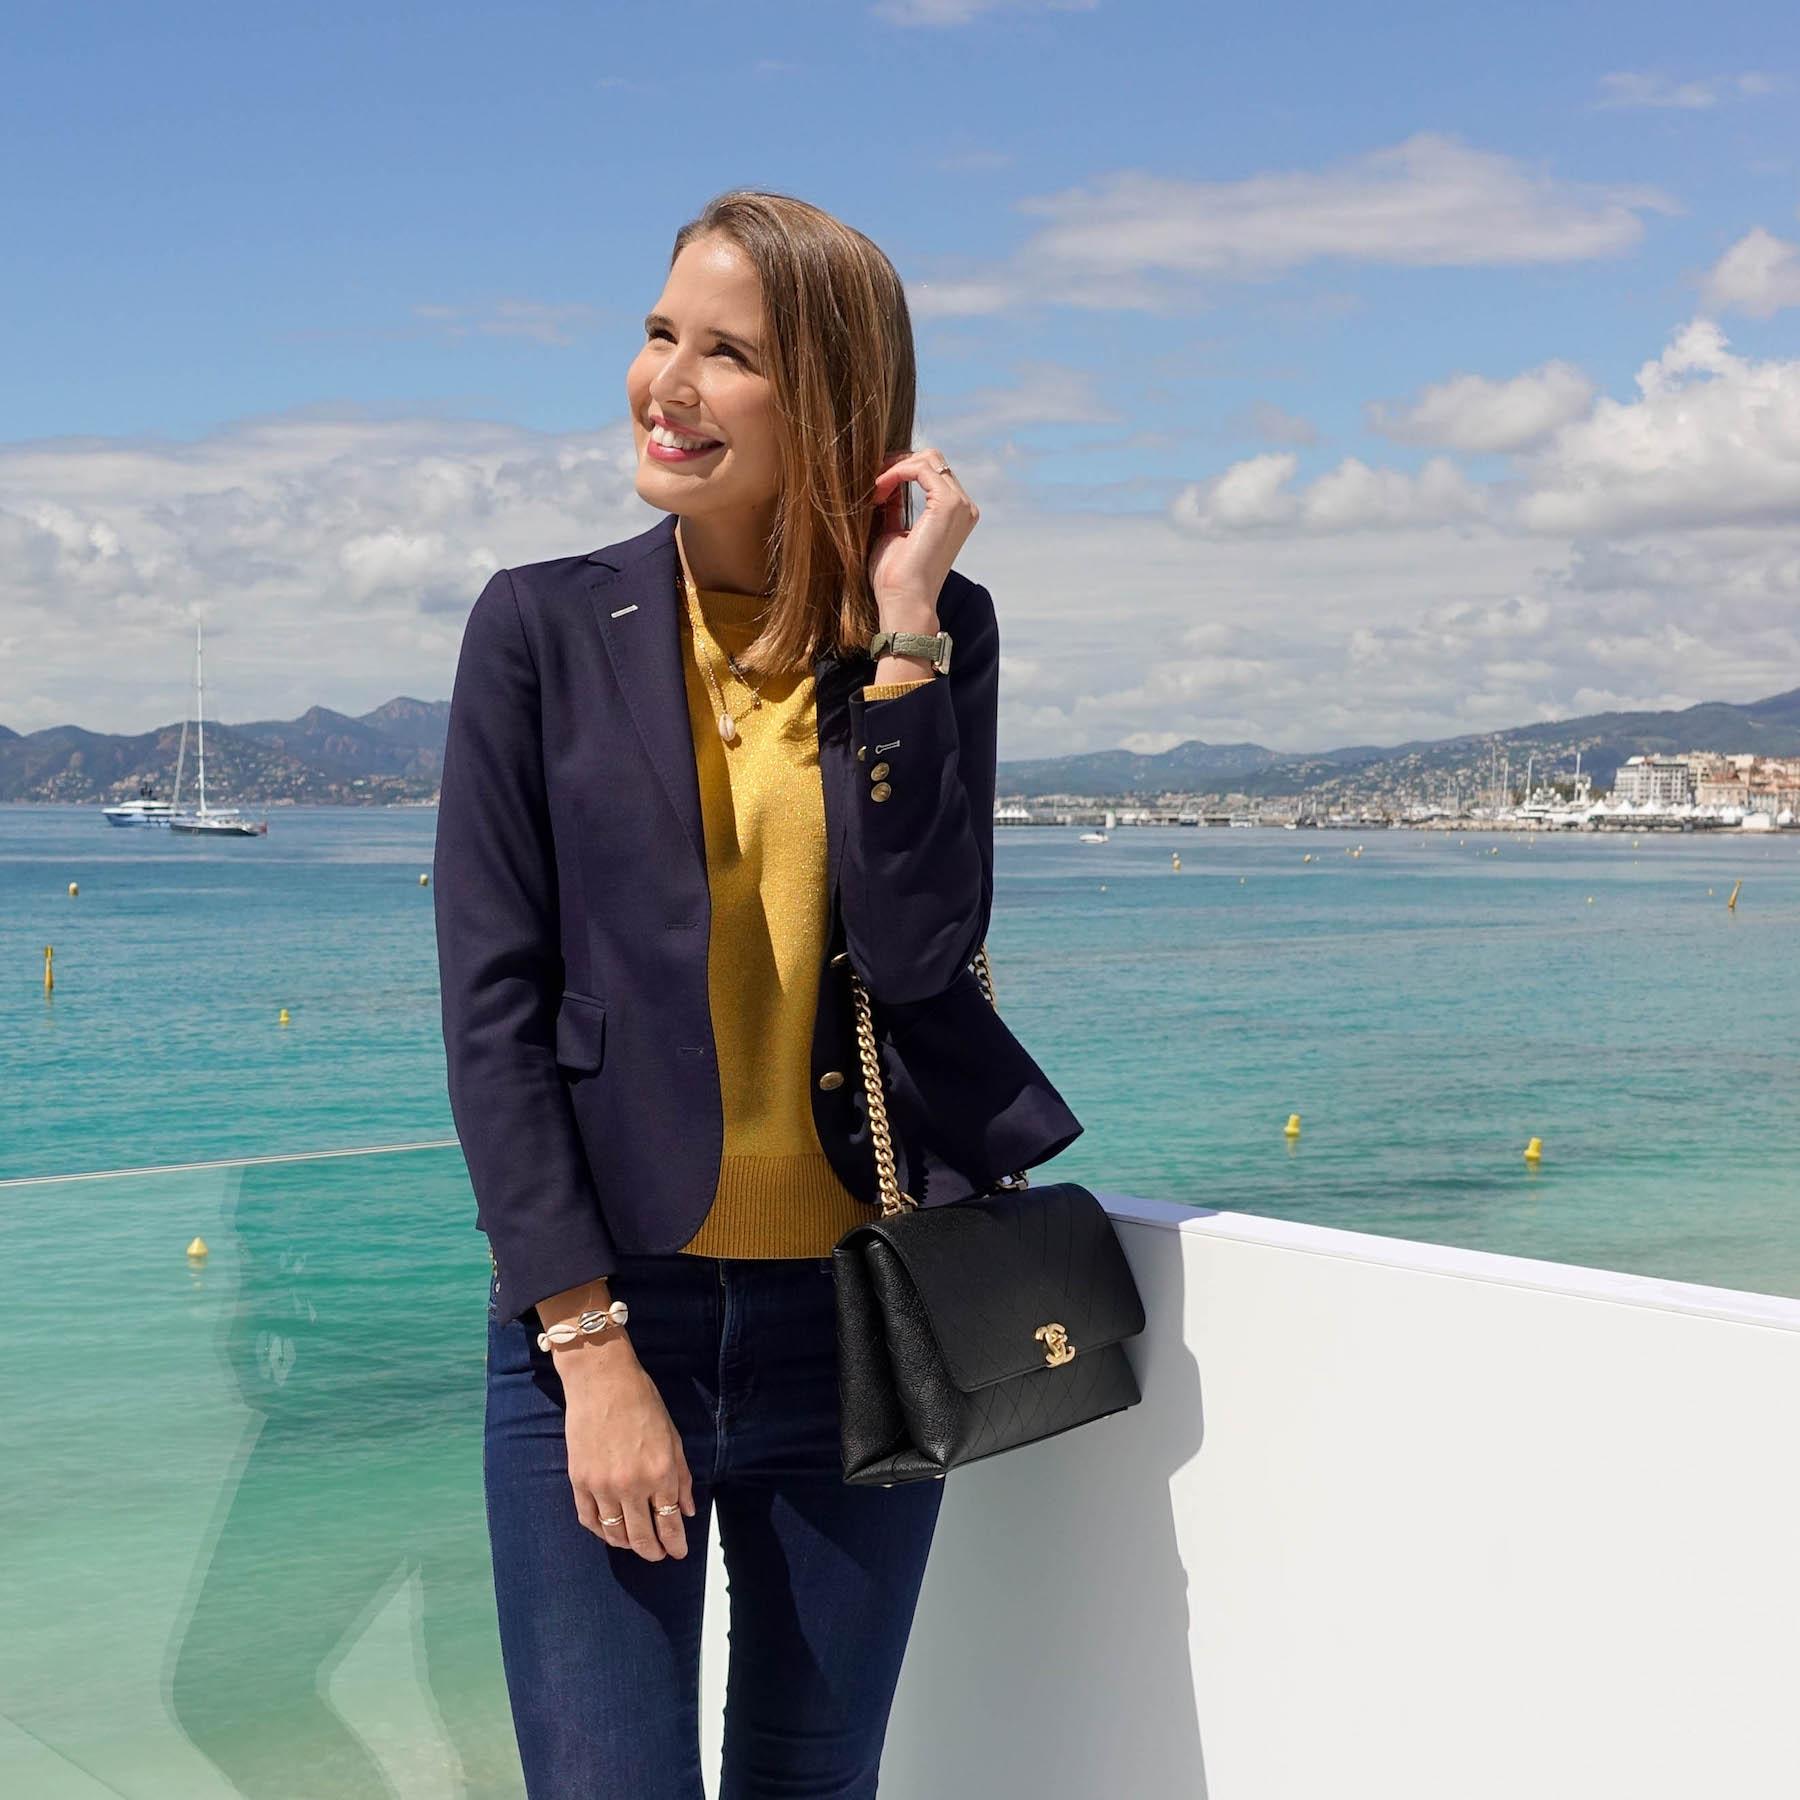 Cannes 2019 suelovesnyc_cannes_filmfestspiele_susan_fengler_croisette